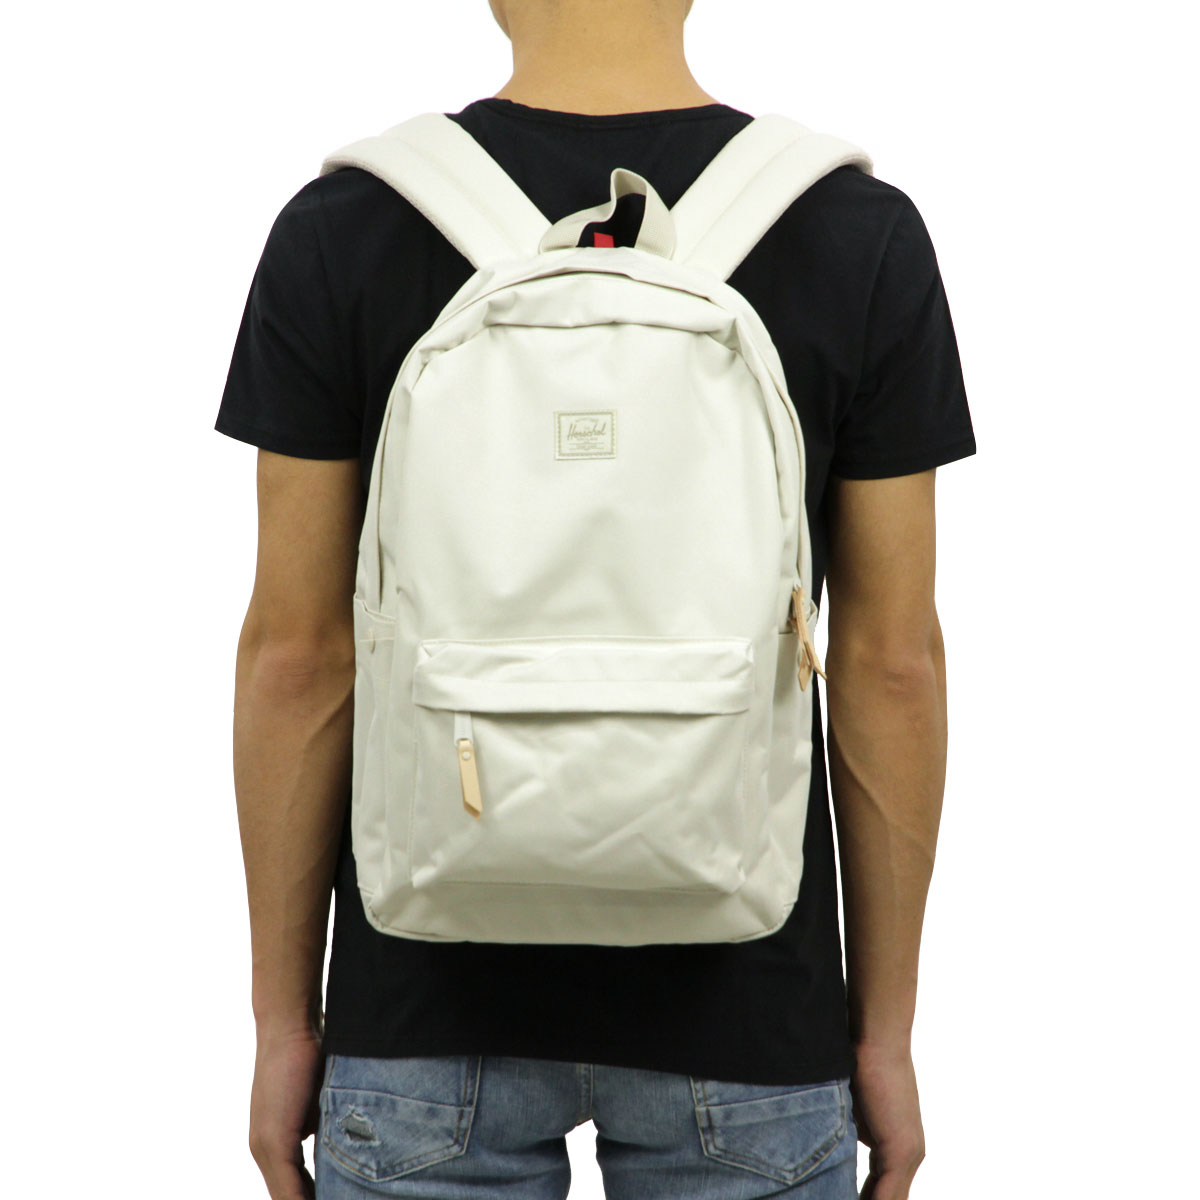 Hershel supply Herschel Supply regular store bag rucksack backpack WINLAW  BACKPACK FOUNDATION 10230-01815-OS SILVER BIRCH 7aae179025b41